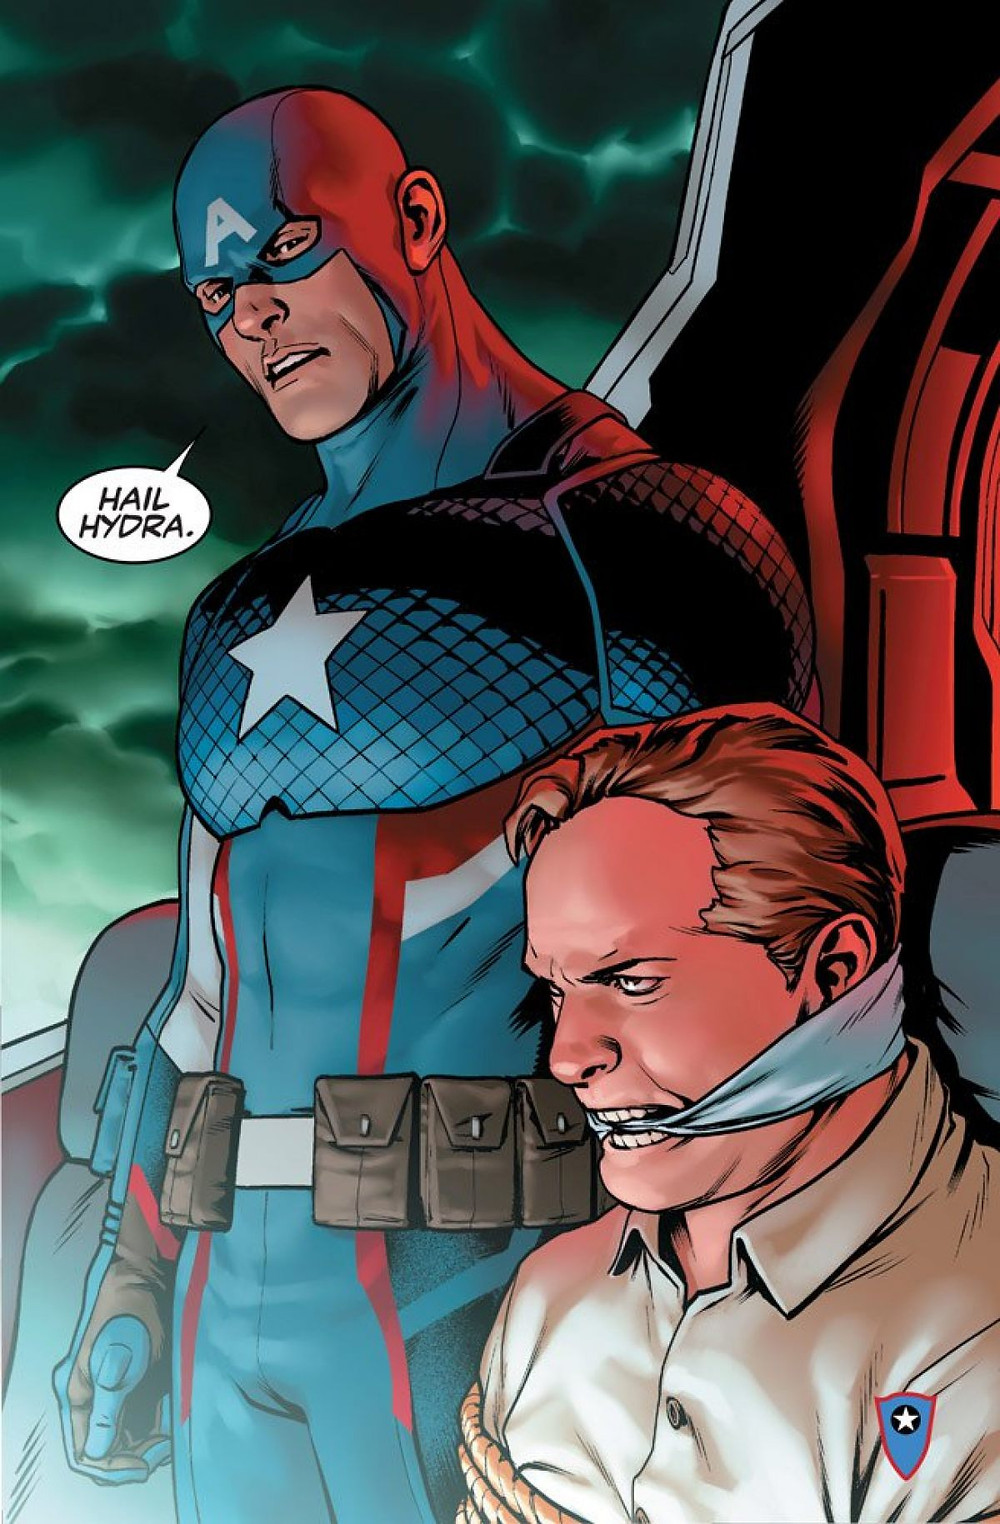 avengers captain america hail hydra reference elevator